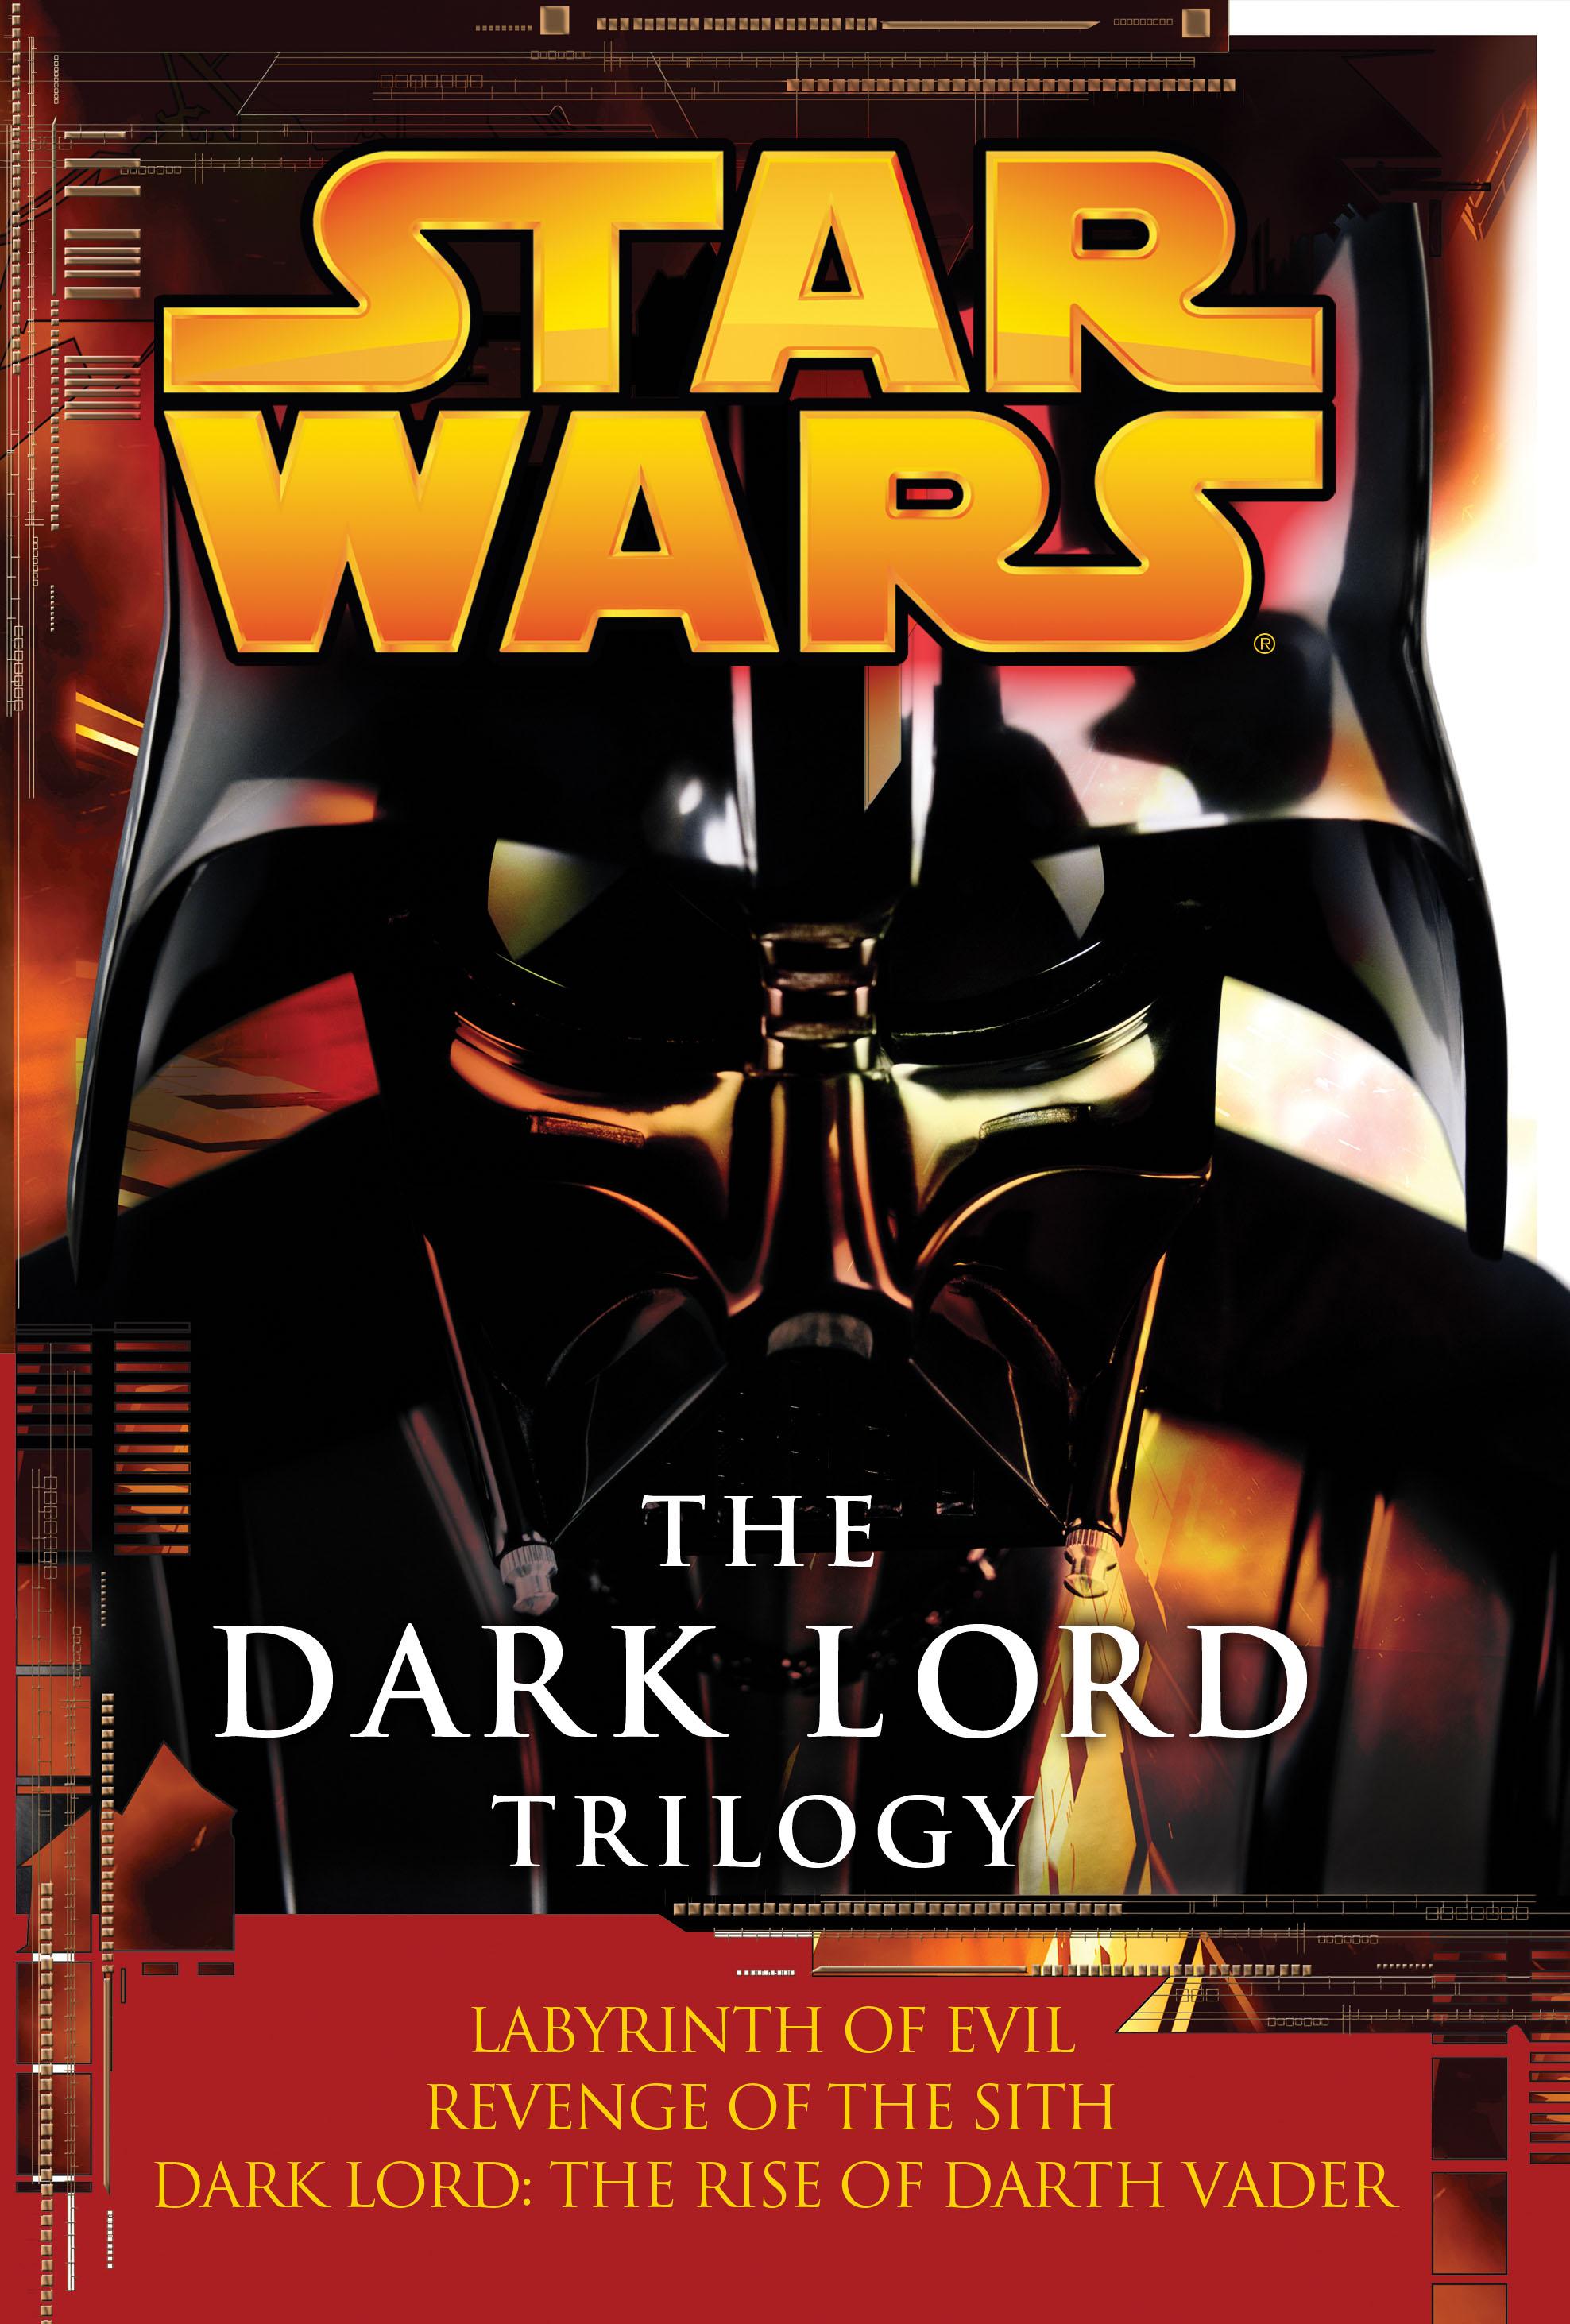 The_Dark_Lord_Trilogy.jpg